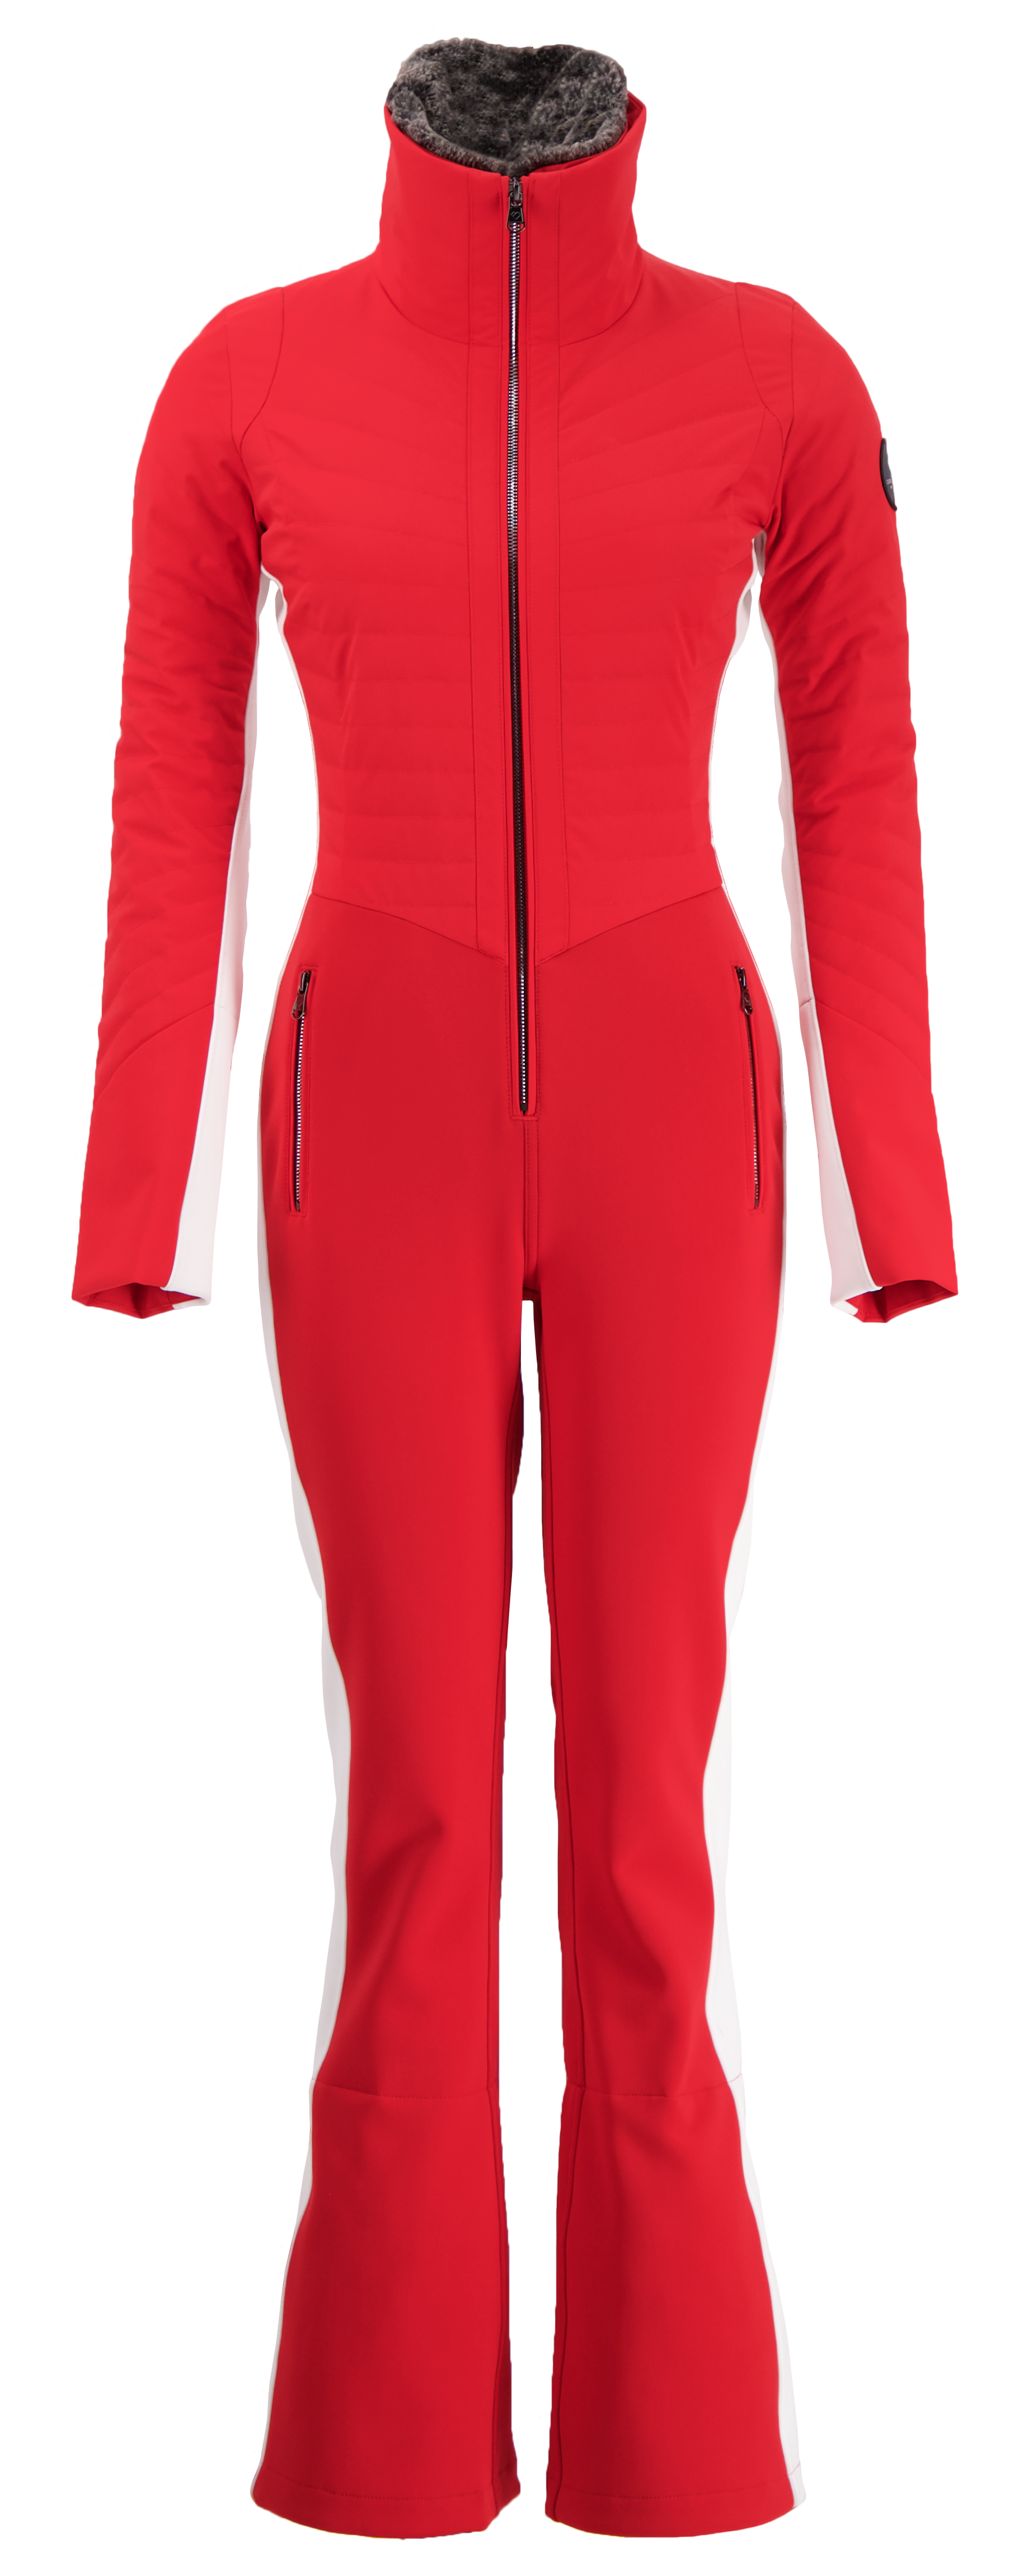 Bella Coola Jacket